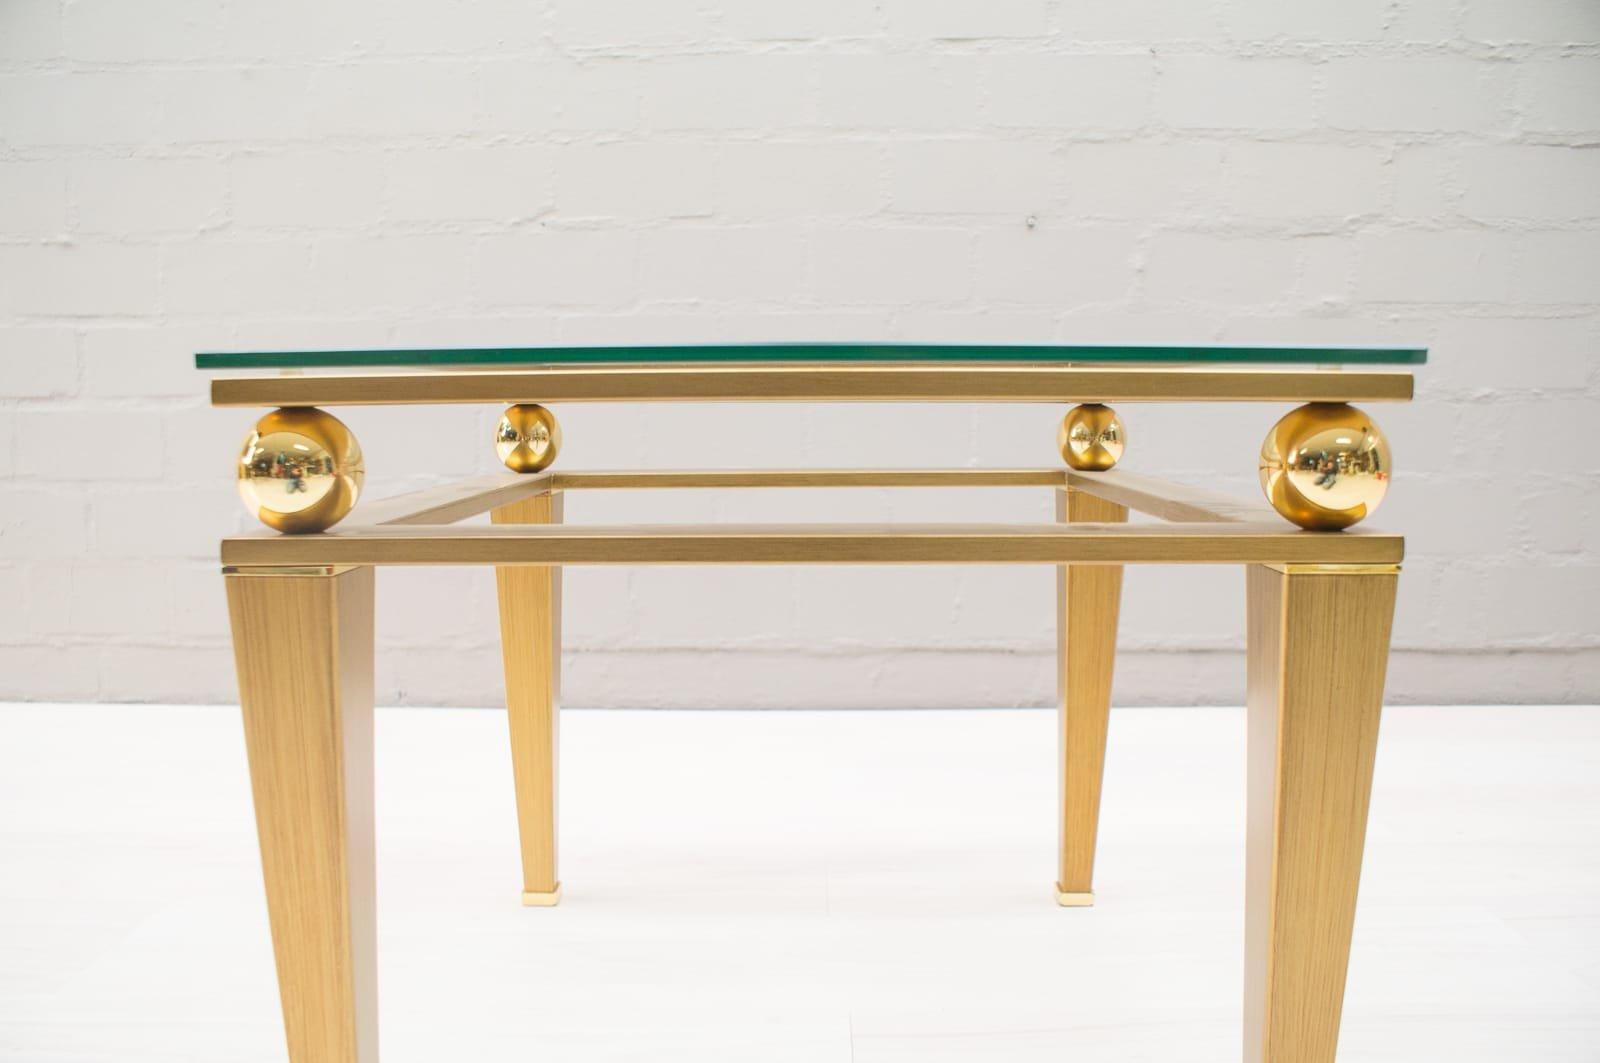 hollywood regency couchtisch aus vergoldetem messing 1960er bei pamono kaufen. Black Bedroom Furniture Sets. Home Design Ideas